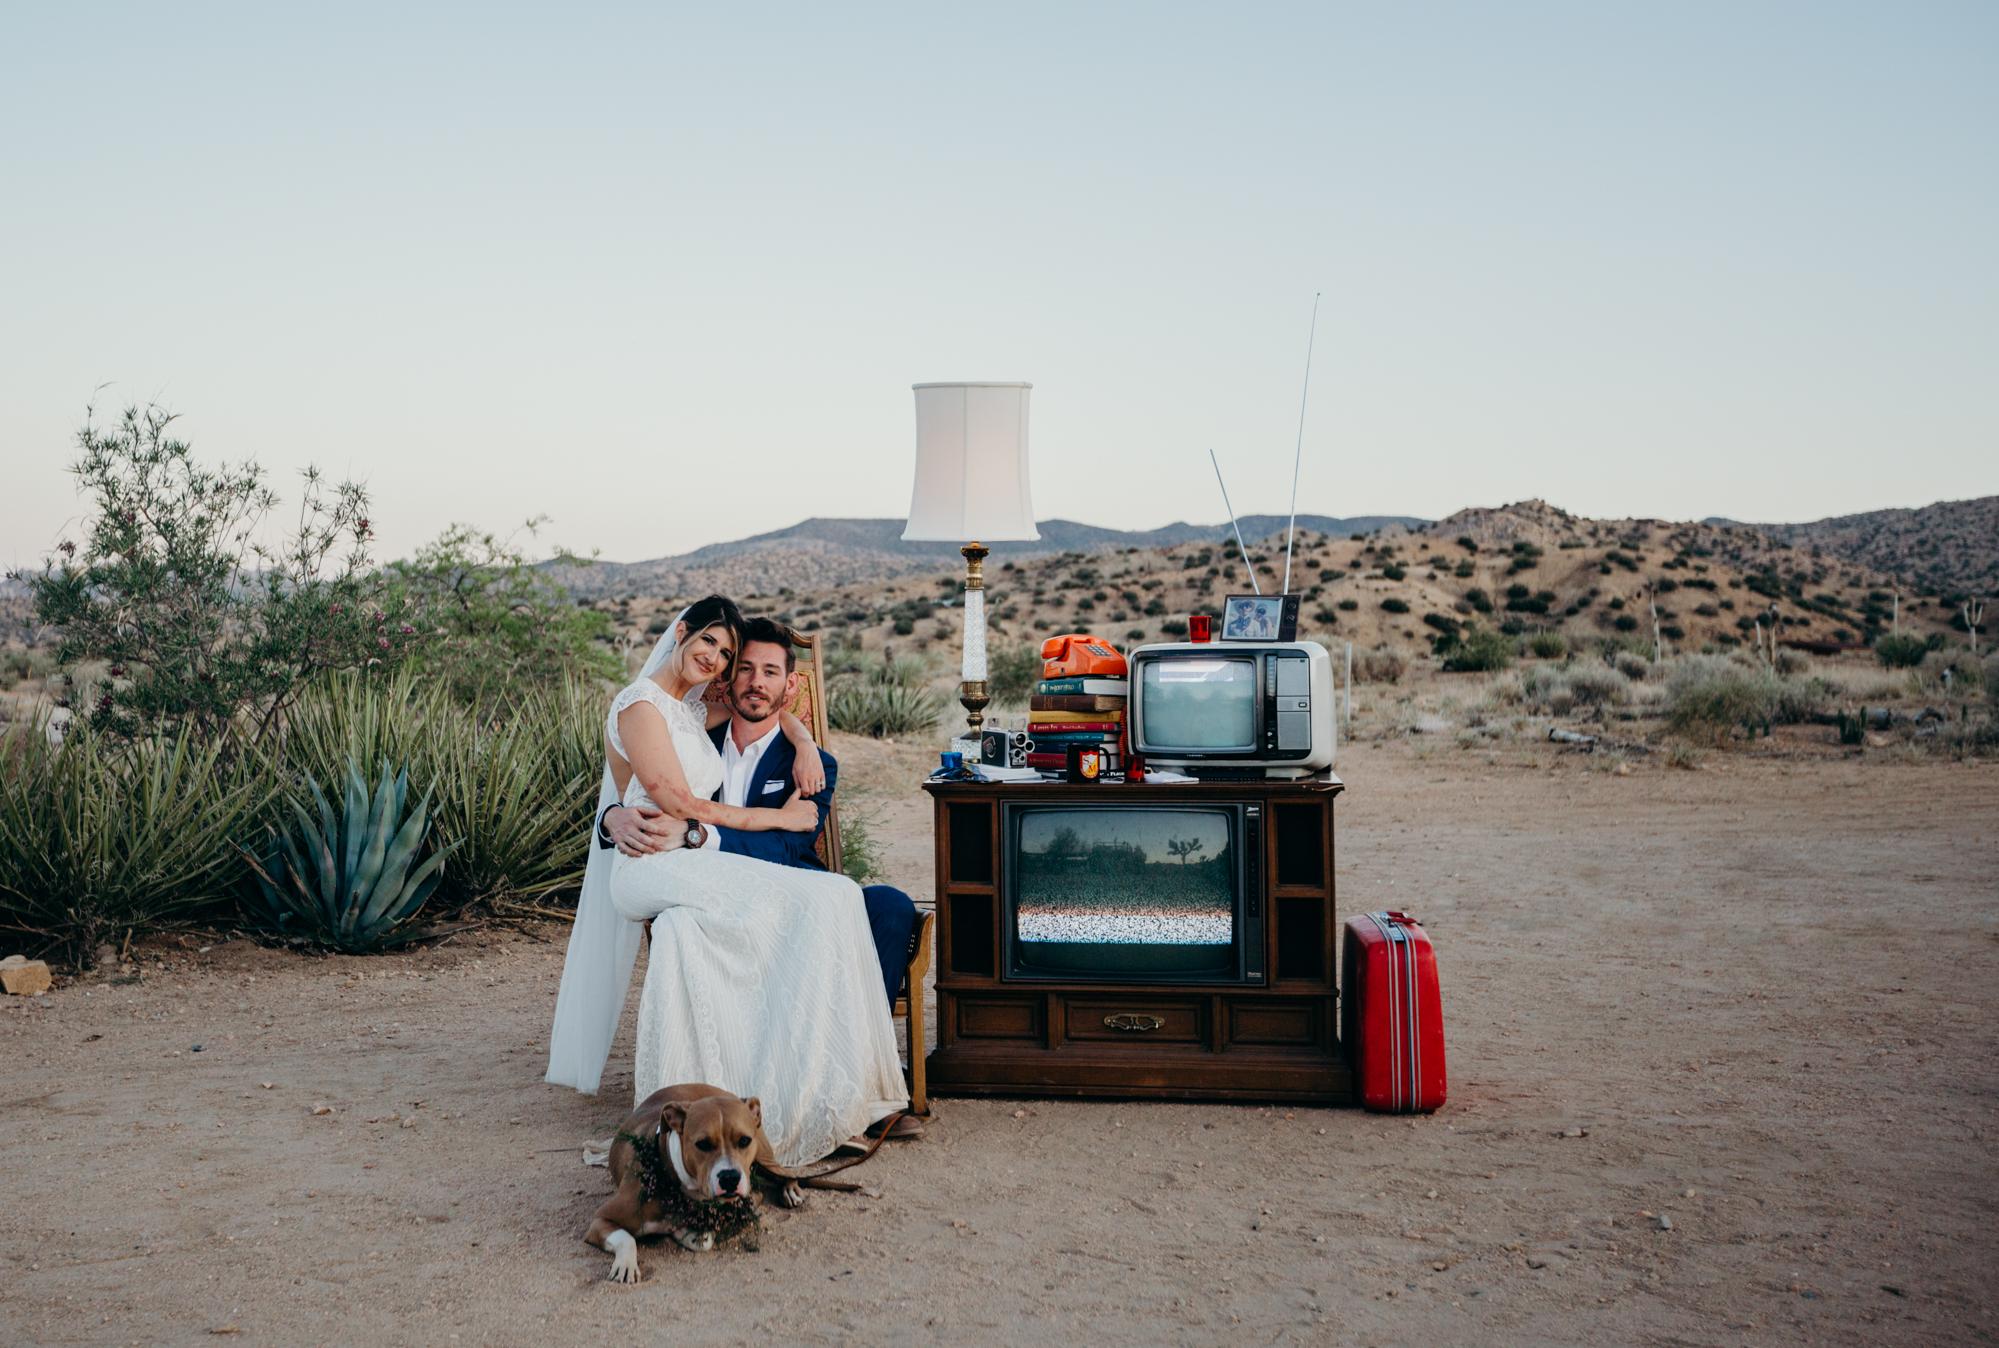 casey-brodley-wedding-photographer-videographer-michigan.jpg